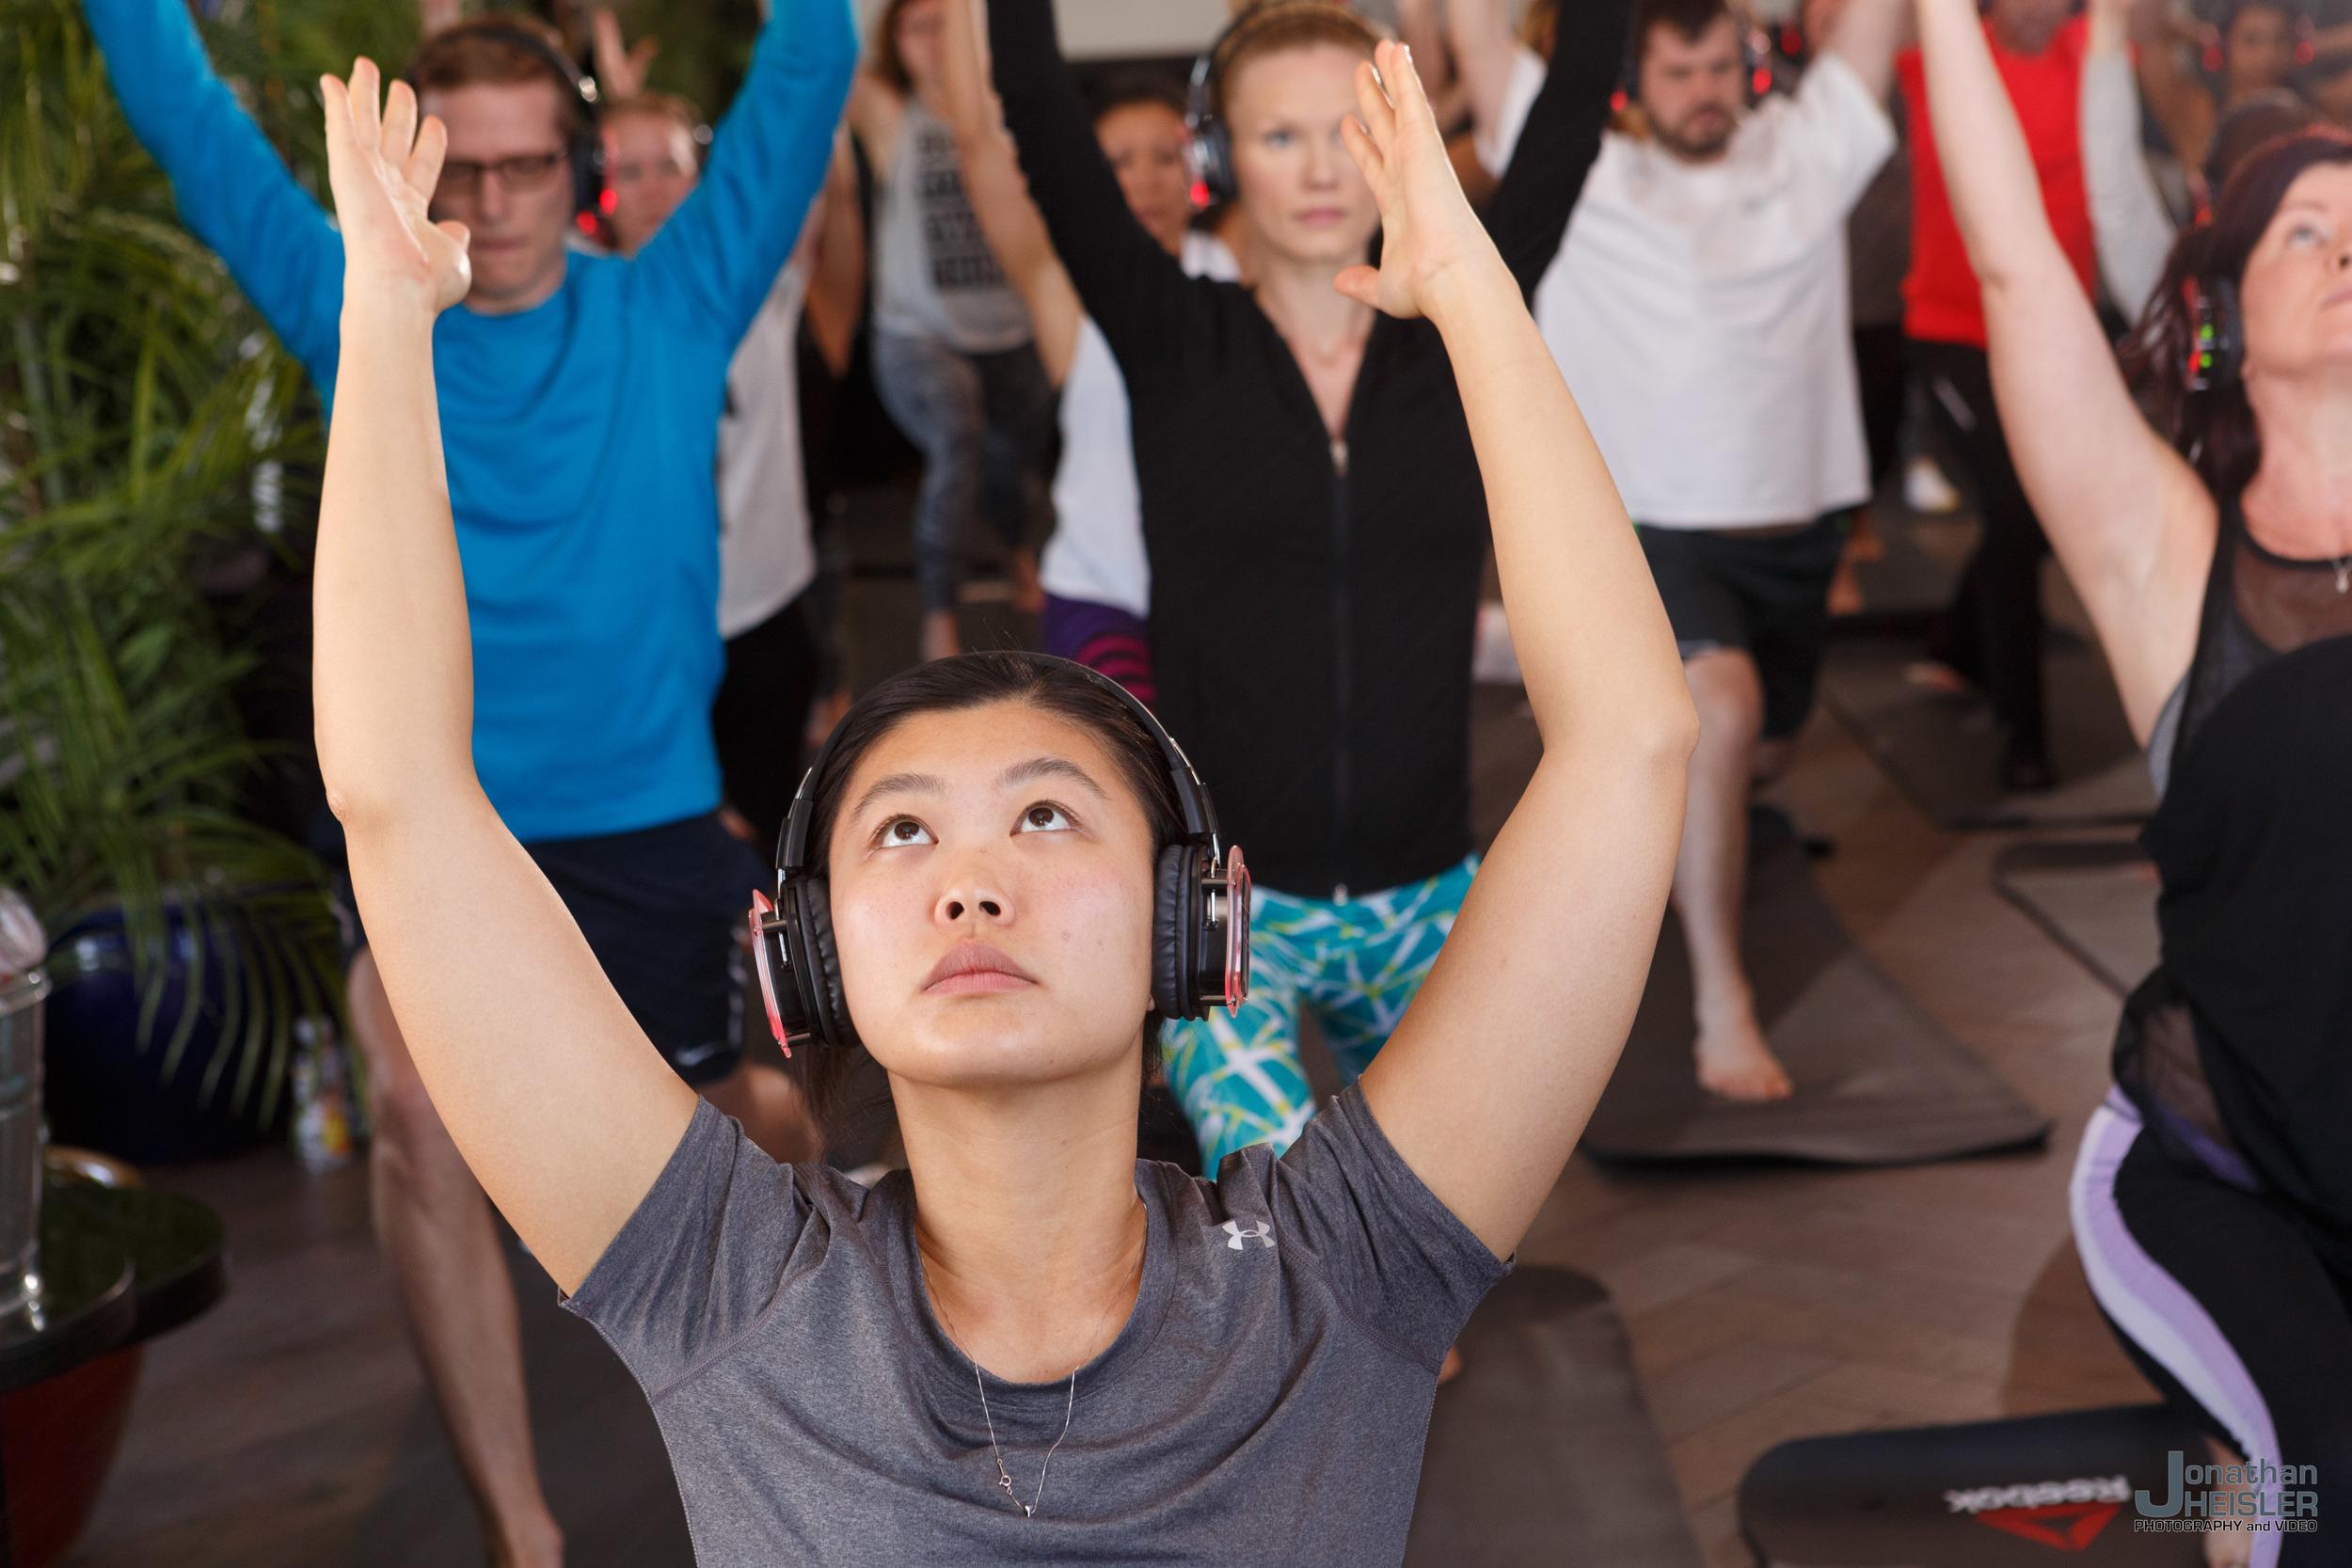 Reebok NYC Yoga_ Gansevoort Hotel NYC __  Jonathan Heisler _ 11.21.2015_007f_5.6.jpg